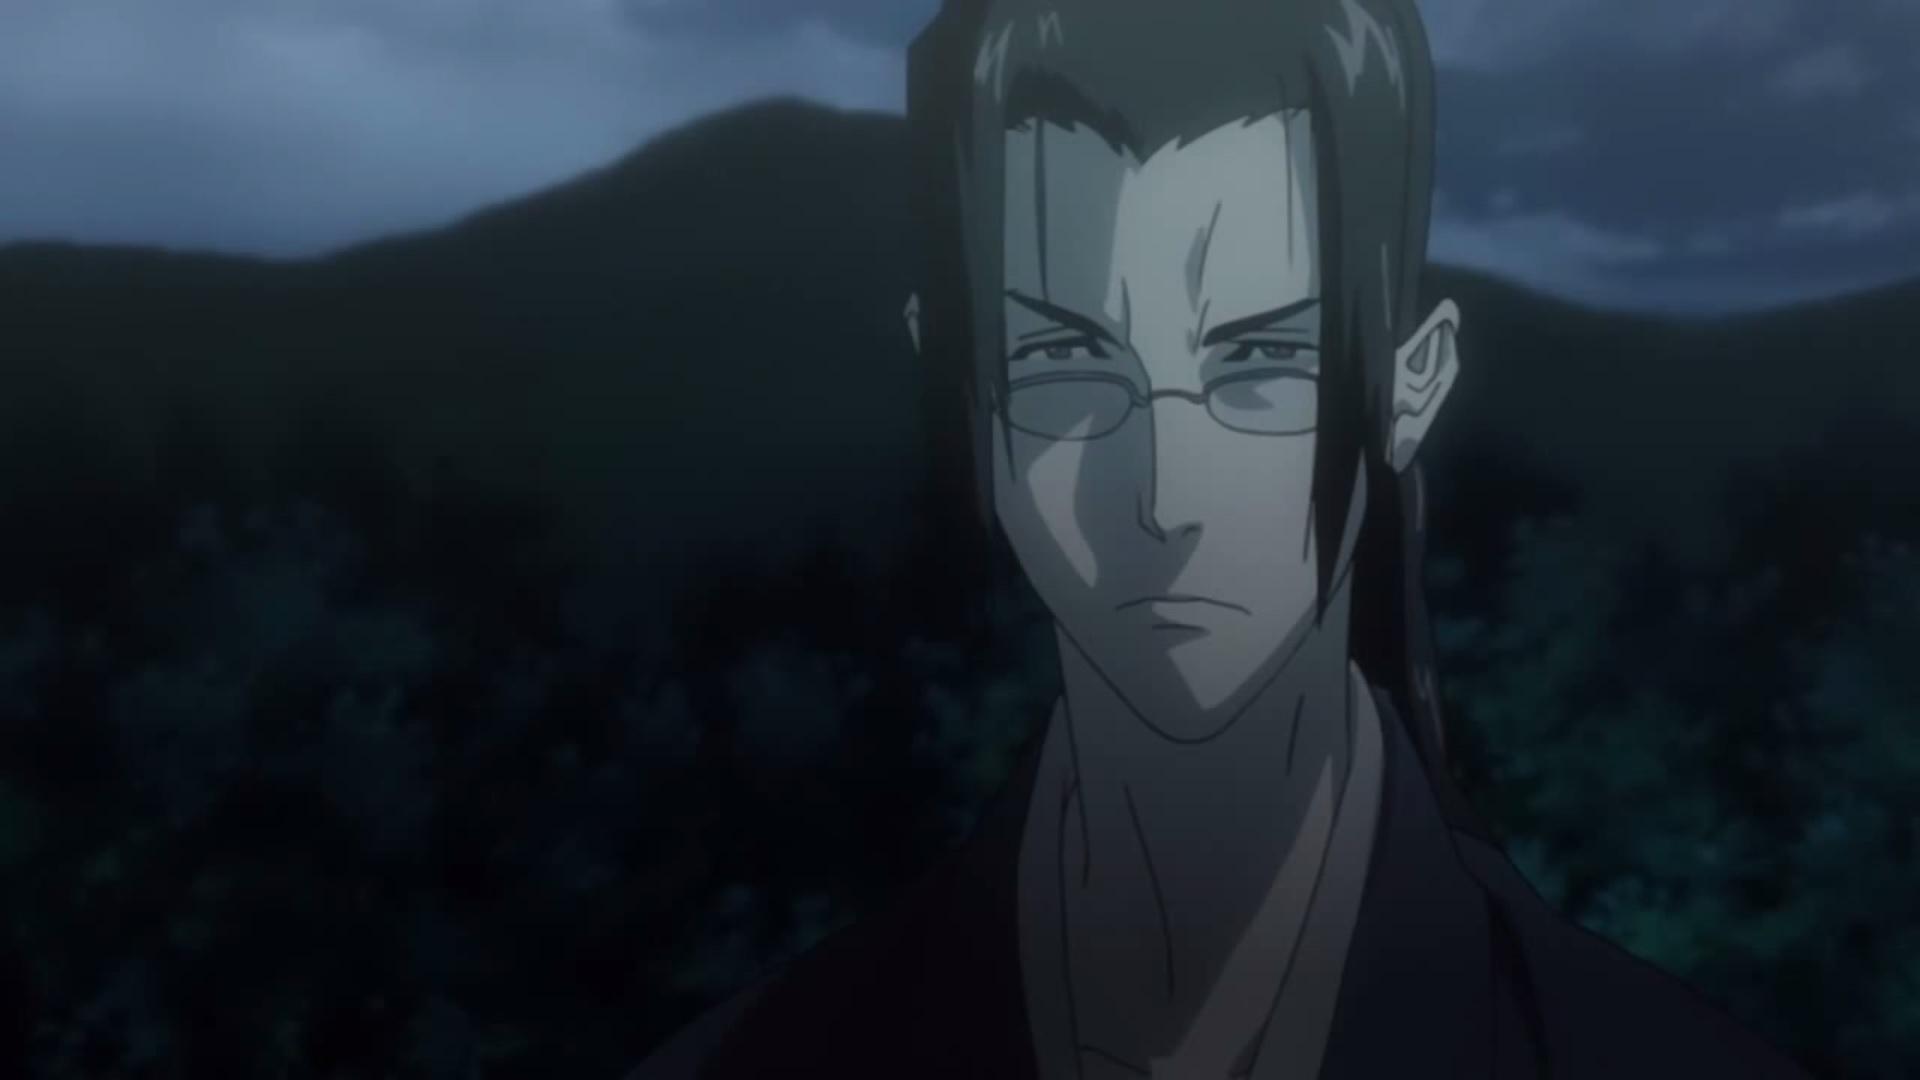 samurai champloo  u2013 review  u2013 historical shit hits the fan   u2013 daniel sees anime